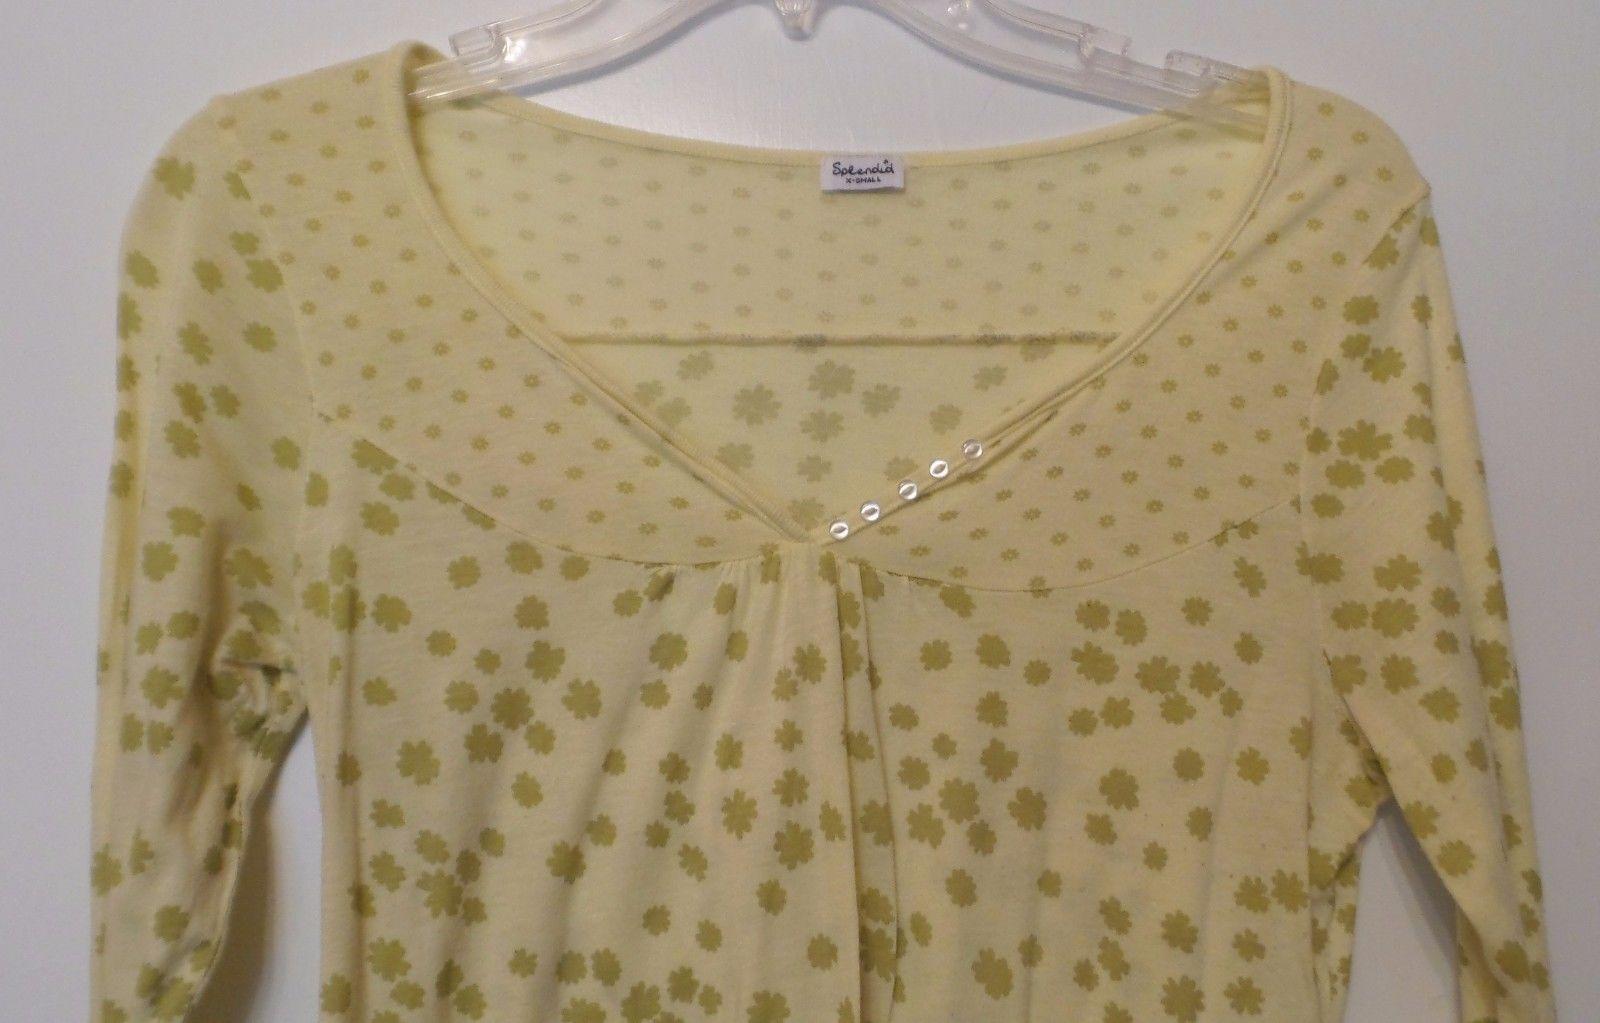 Anthropologie SPLENDID Pima Cotton Modal Light Long Sleeve Knit Top Size XS